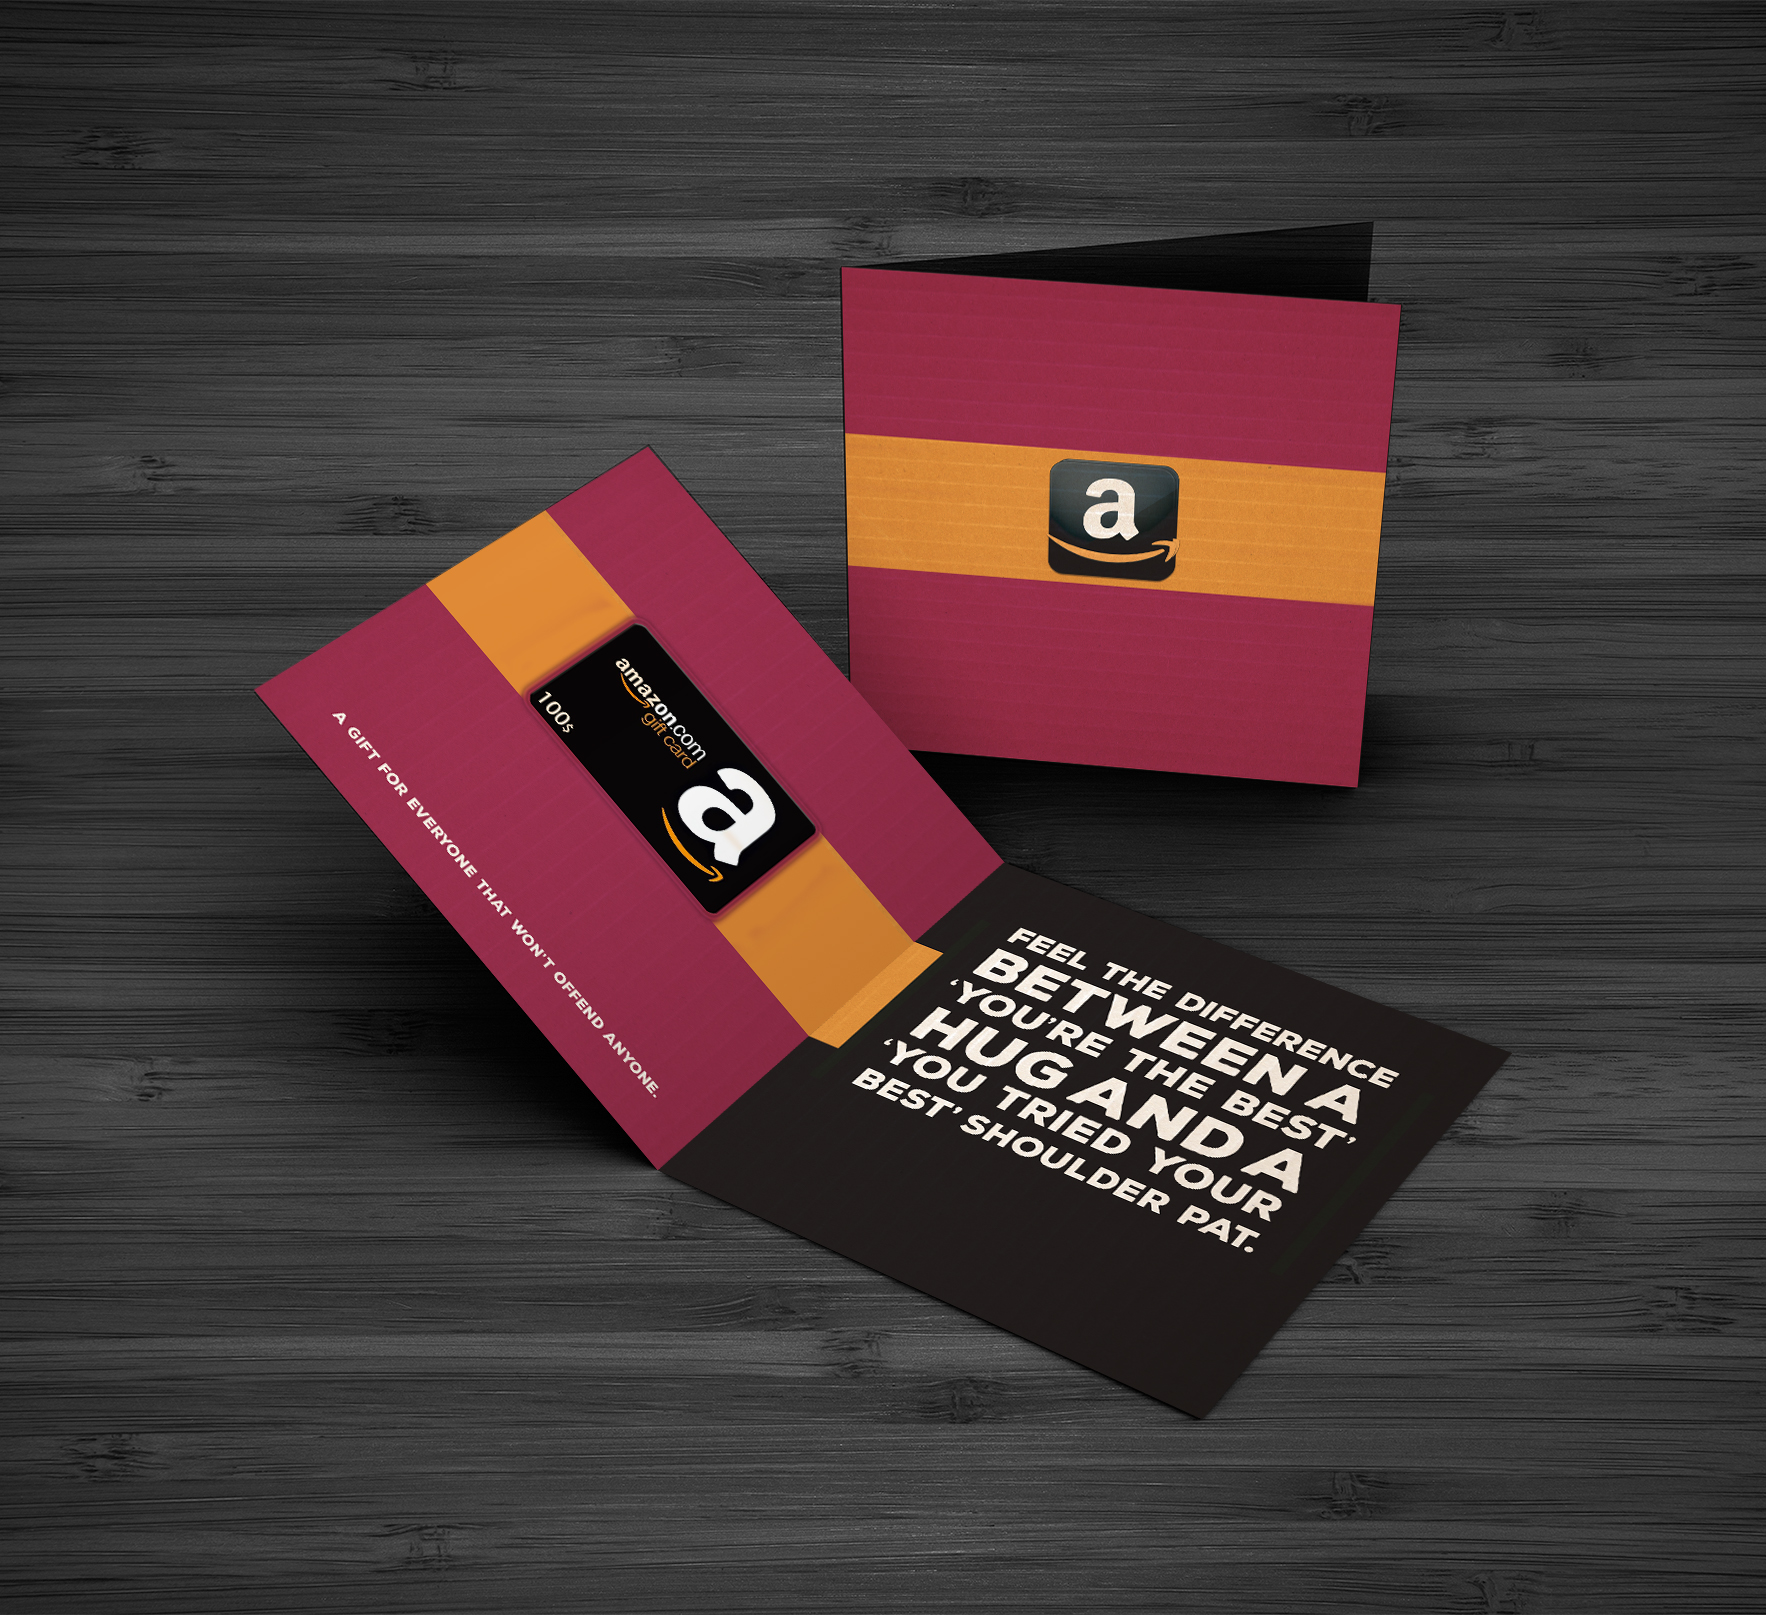 Amazon_Greetings Card Mockup_3.jpg